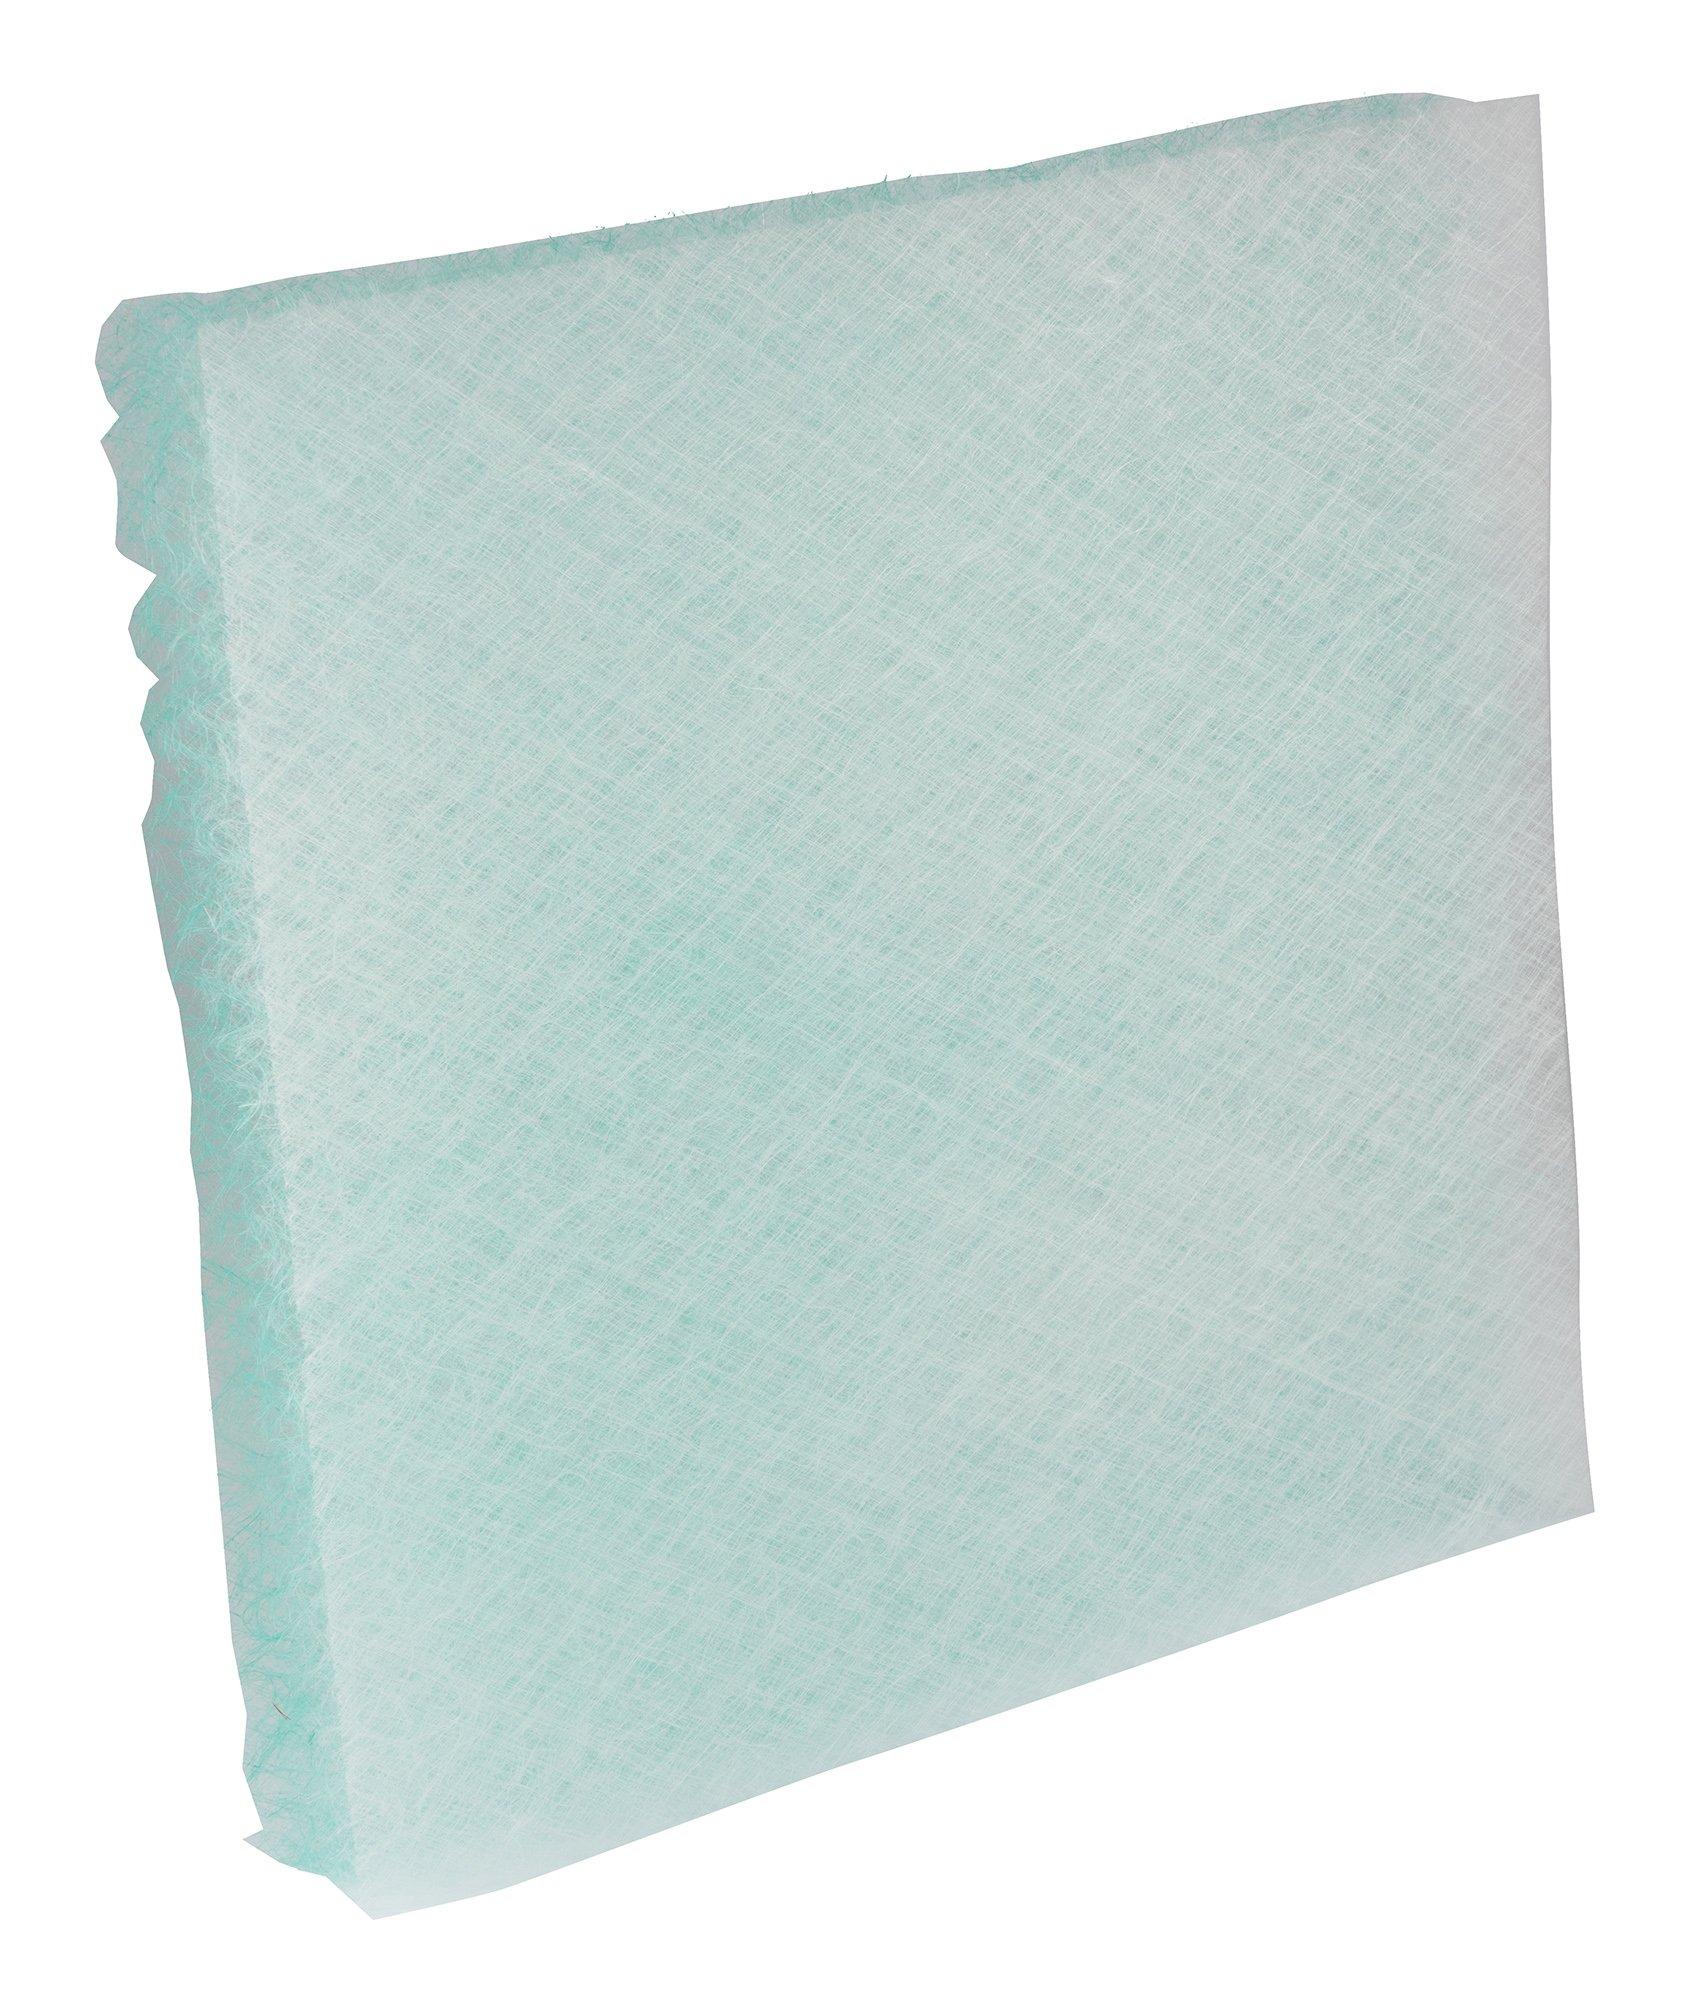 Chemco, 2020250PD, 20''x20''x2'' PD Fiberglass Paint Arrestor Pads 250/Case